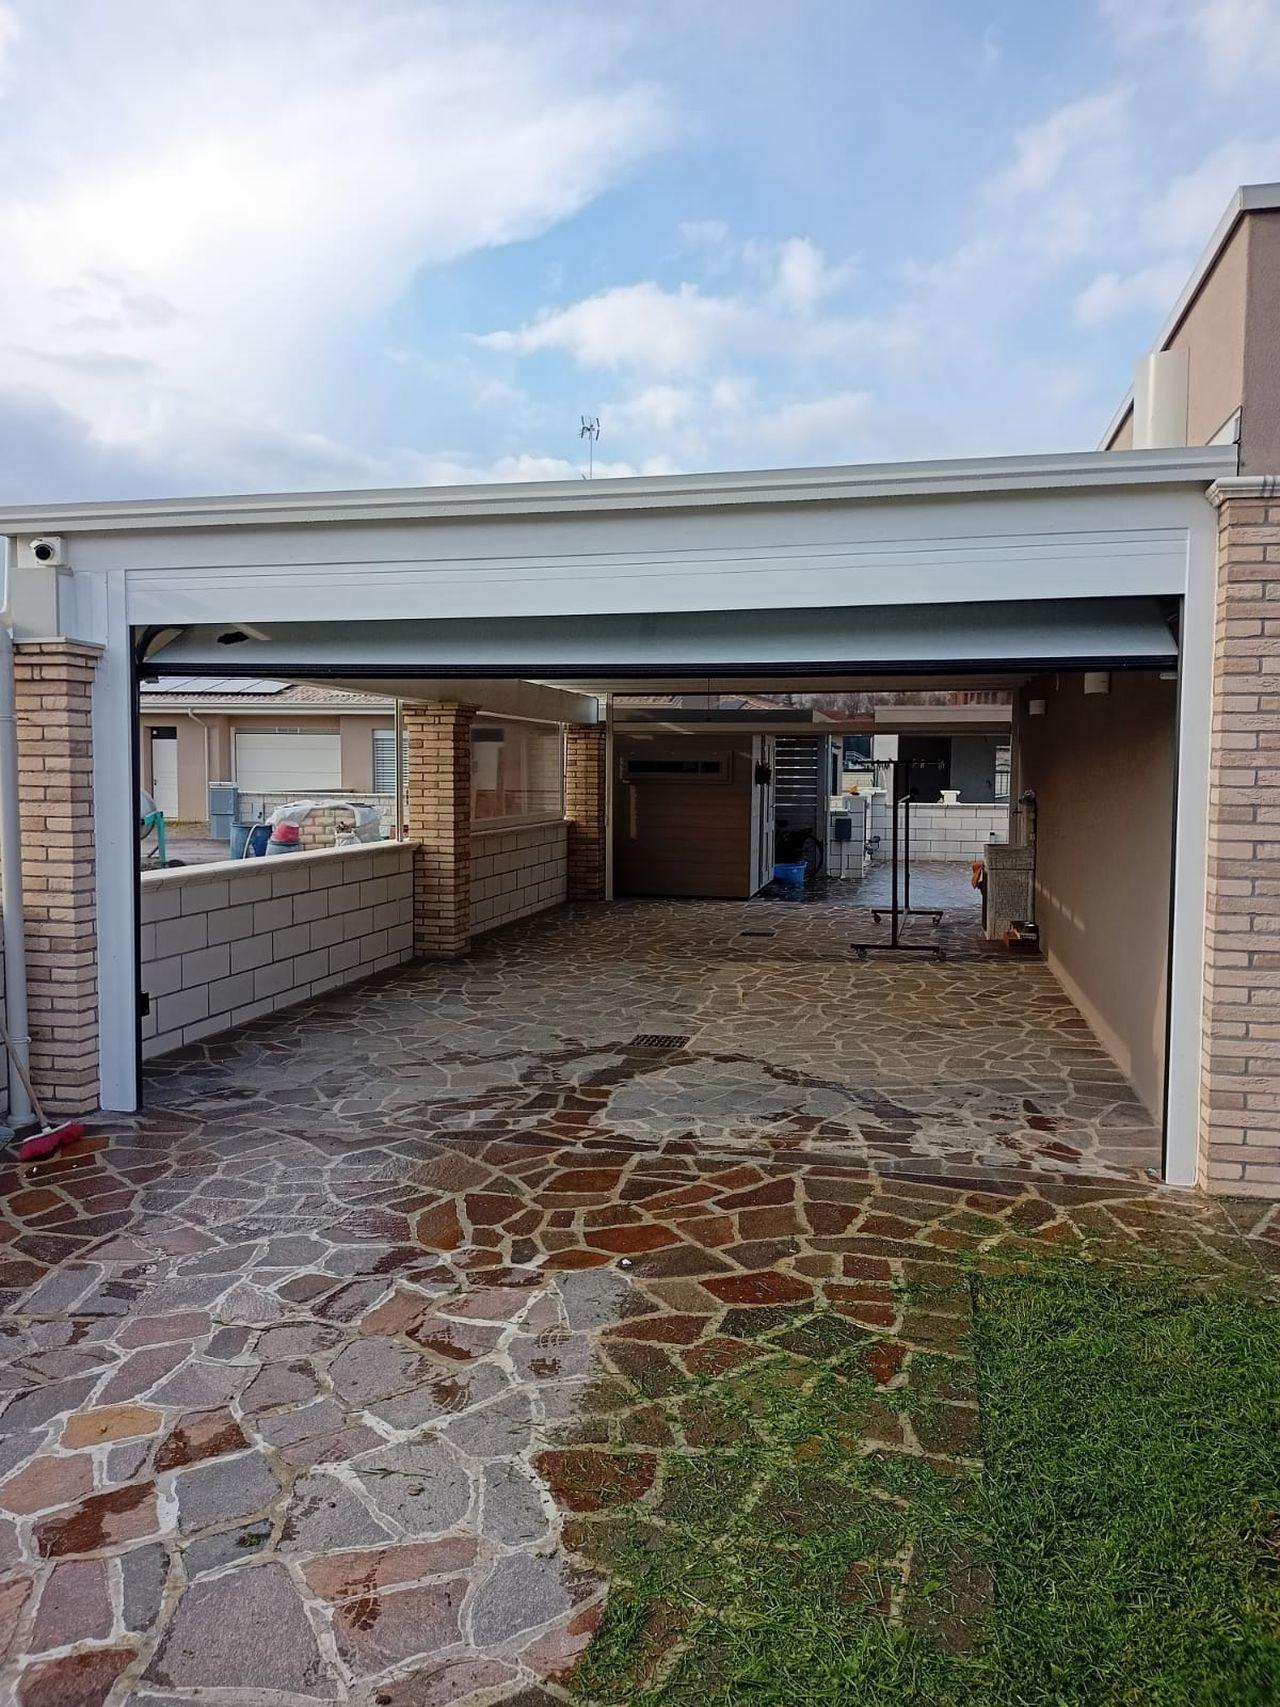 Porte sezionali civili De Biasi Mantova Modena Reggio Emilia Verona